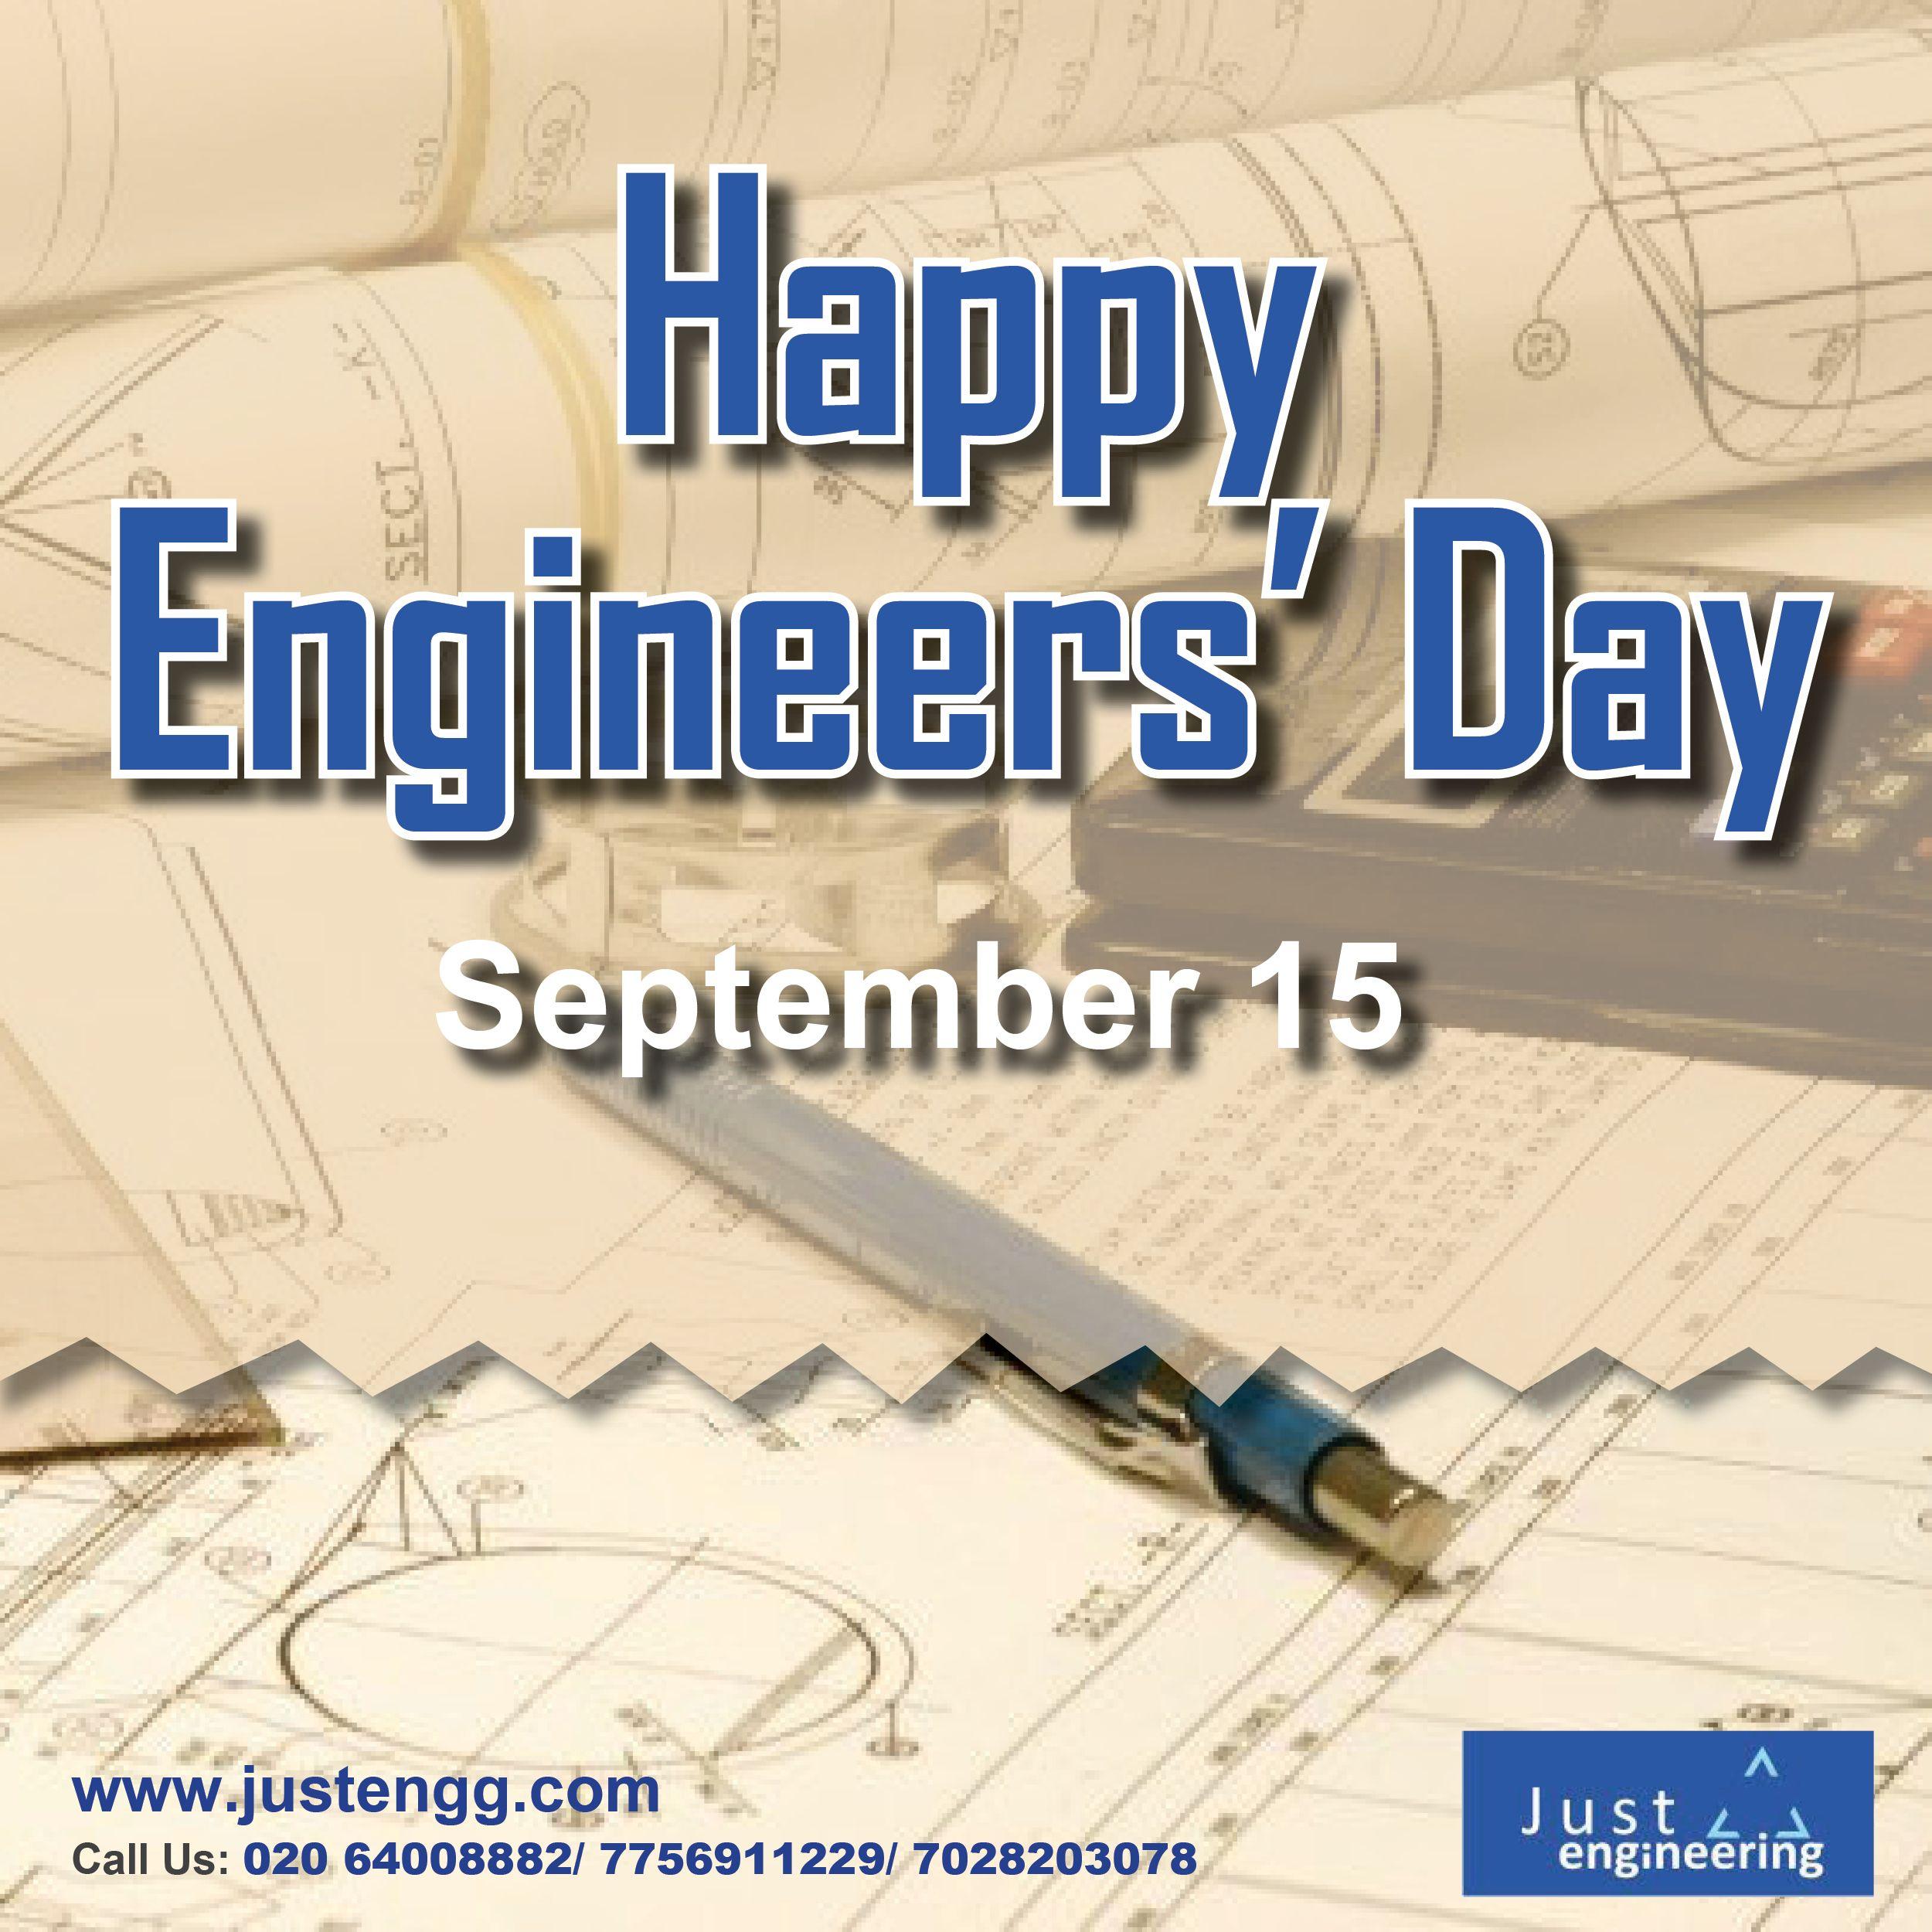 HappyEngineers' Day to all Engineers across the globe